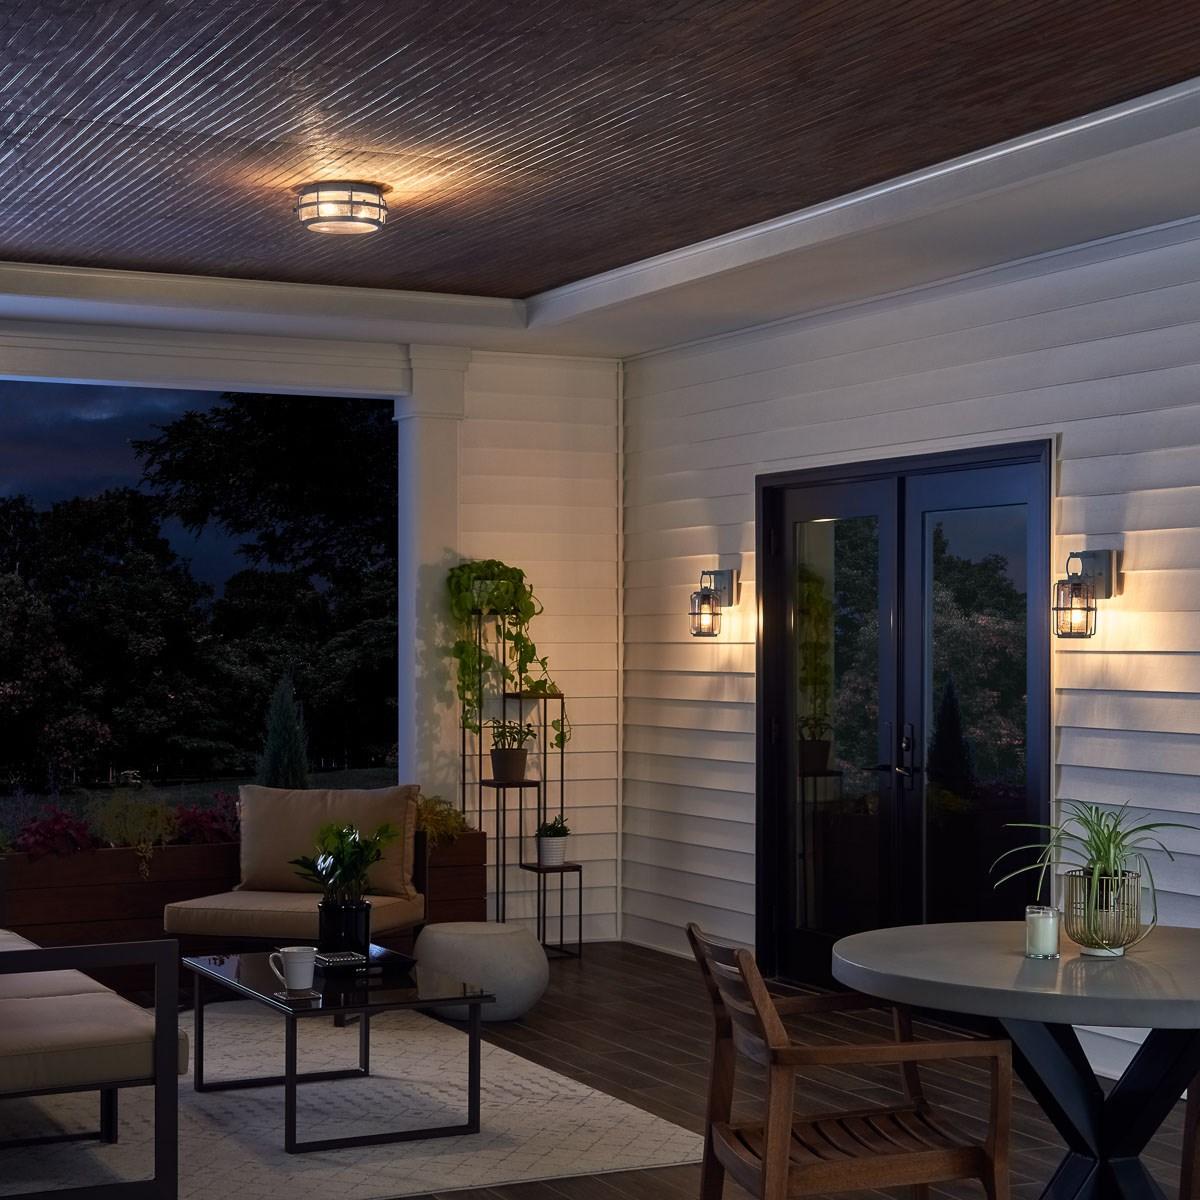 Montview 5 Quot Wall Light Weathered Zinc Kichler Lighting